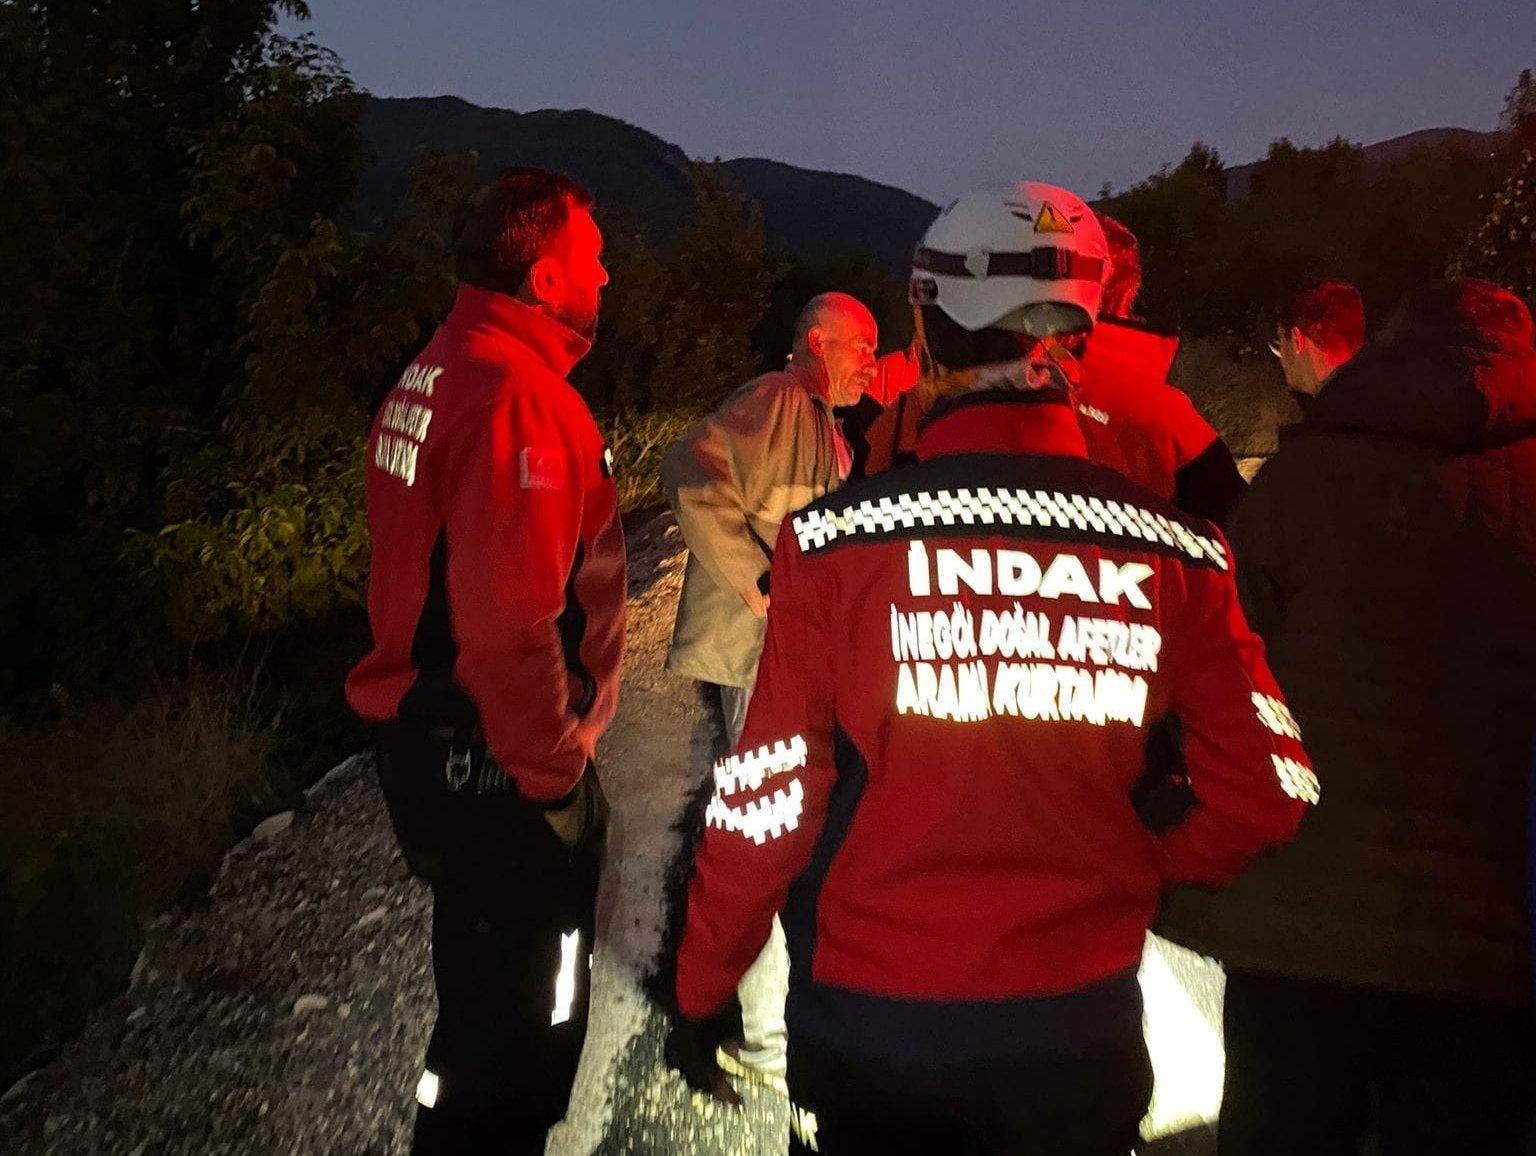 Beyhan Mutlu (C) and rescuers are seen in this photo, Bursa, Turkey, Sept. 28, 2021 (DHA Photo)